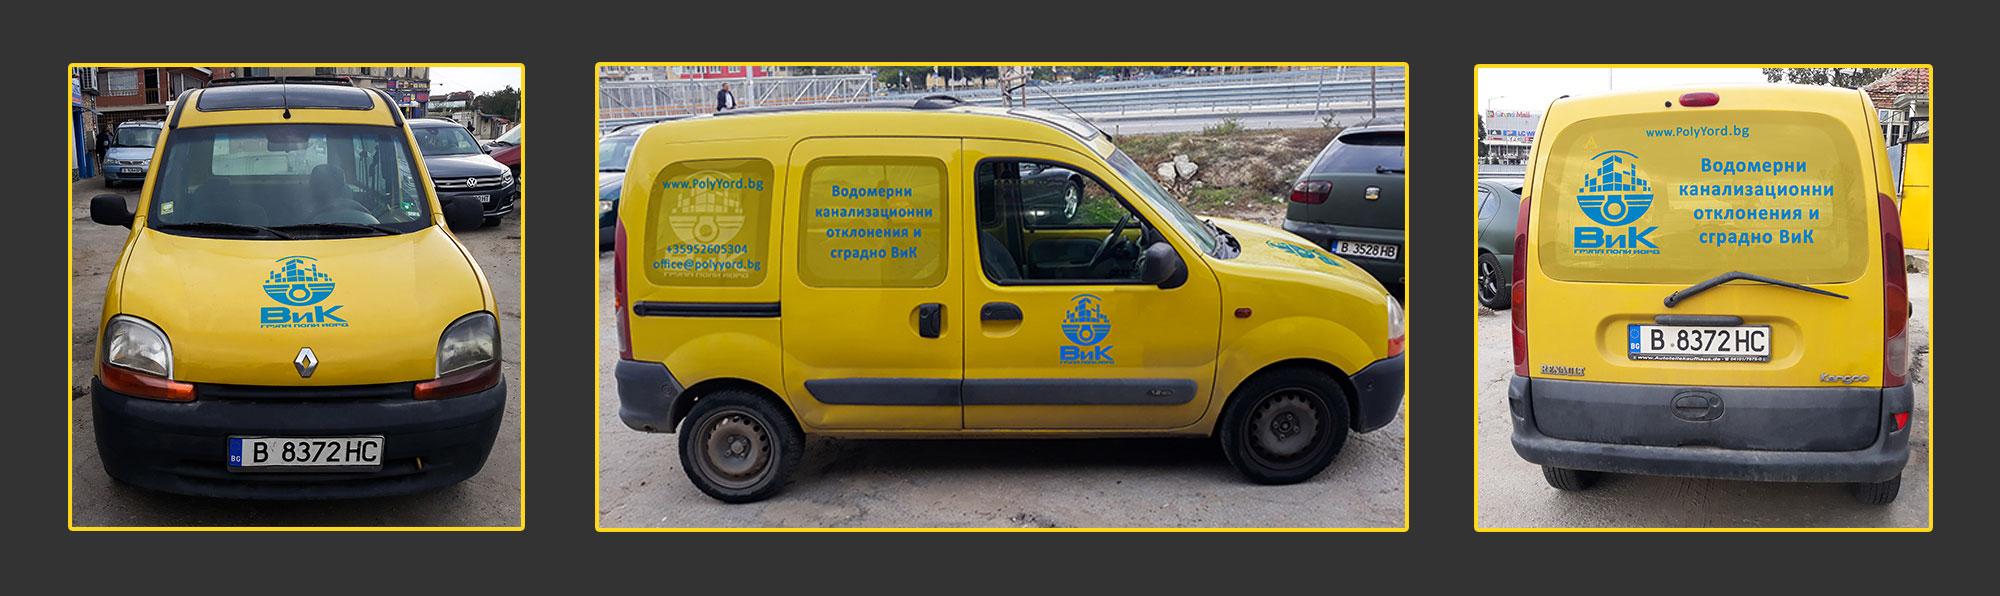 Брандиране на фирмен автомобил за ВиК група Поли Йорд